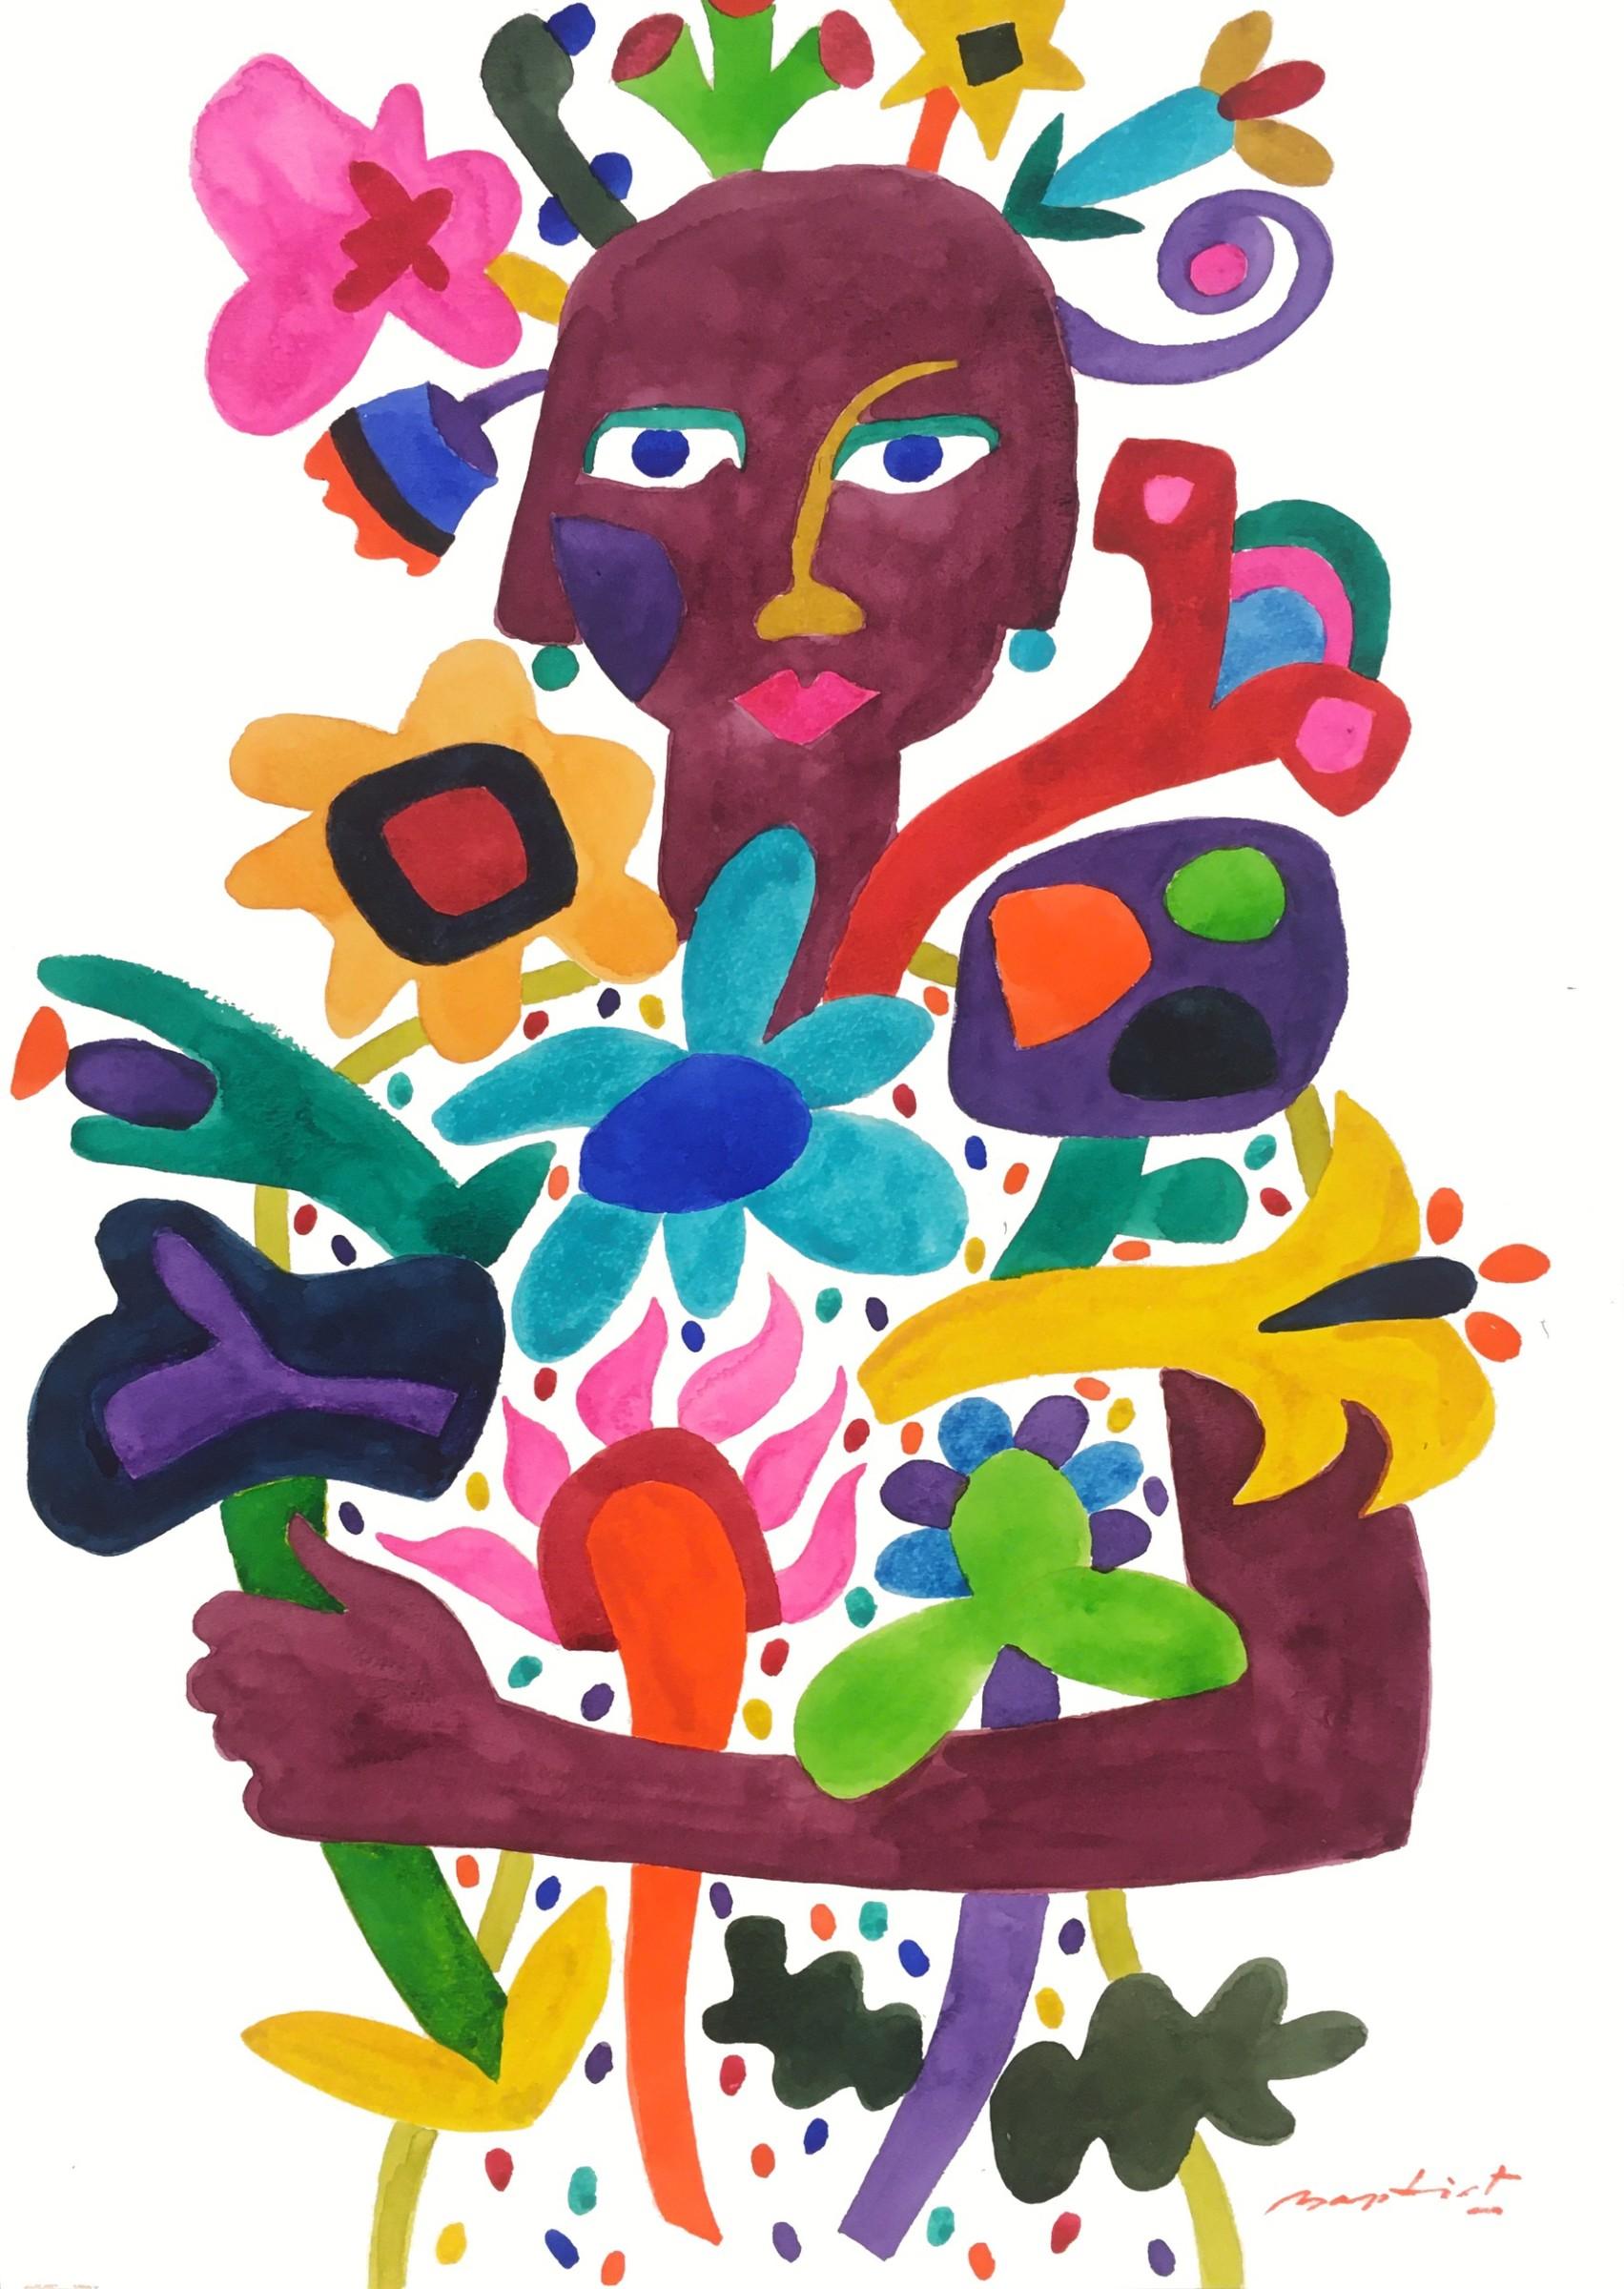 "<span class=""link fancybox-details-link""><a href=""/artists/148-gerry-baptist/works/12674-gerry-baptist-lady-of-the-flowers/"">View Detail Page</a></span><div class=""artist""><span class=""artist""><strong>Gerry Baptist</strong></span></div><div class=""title""><em>Lady of the Flowers</em></div><div class=""medium"">watercolour</div><div class=""dimensions"">Artwork: 42 x 60cm</div><div class=""price"">£2,100.00</div>"